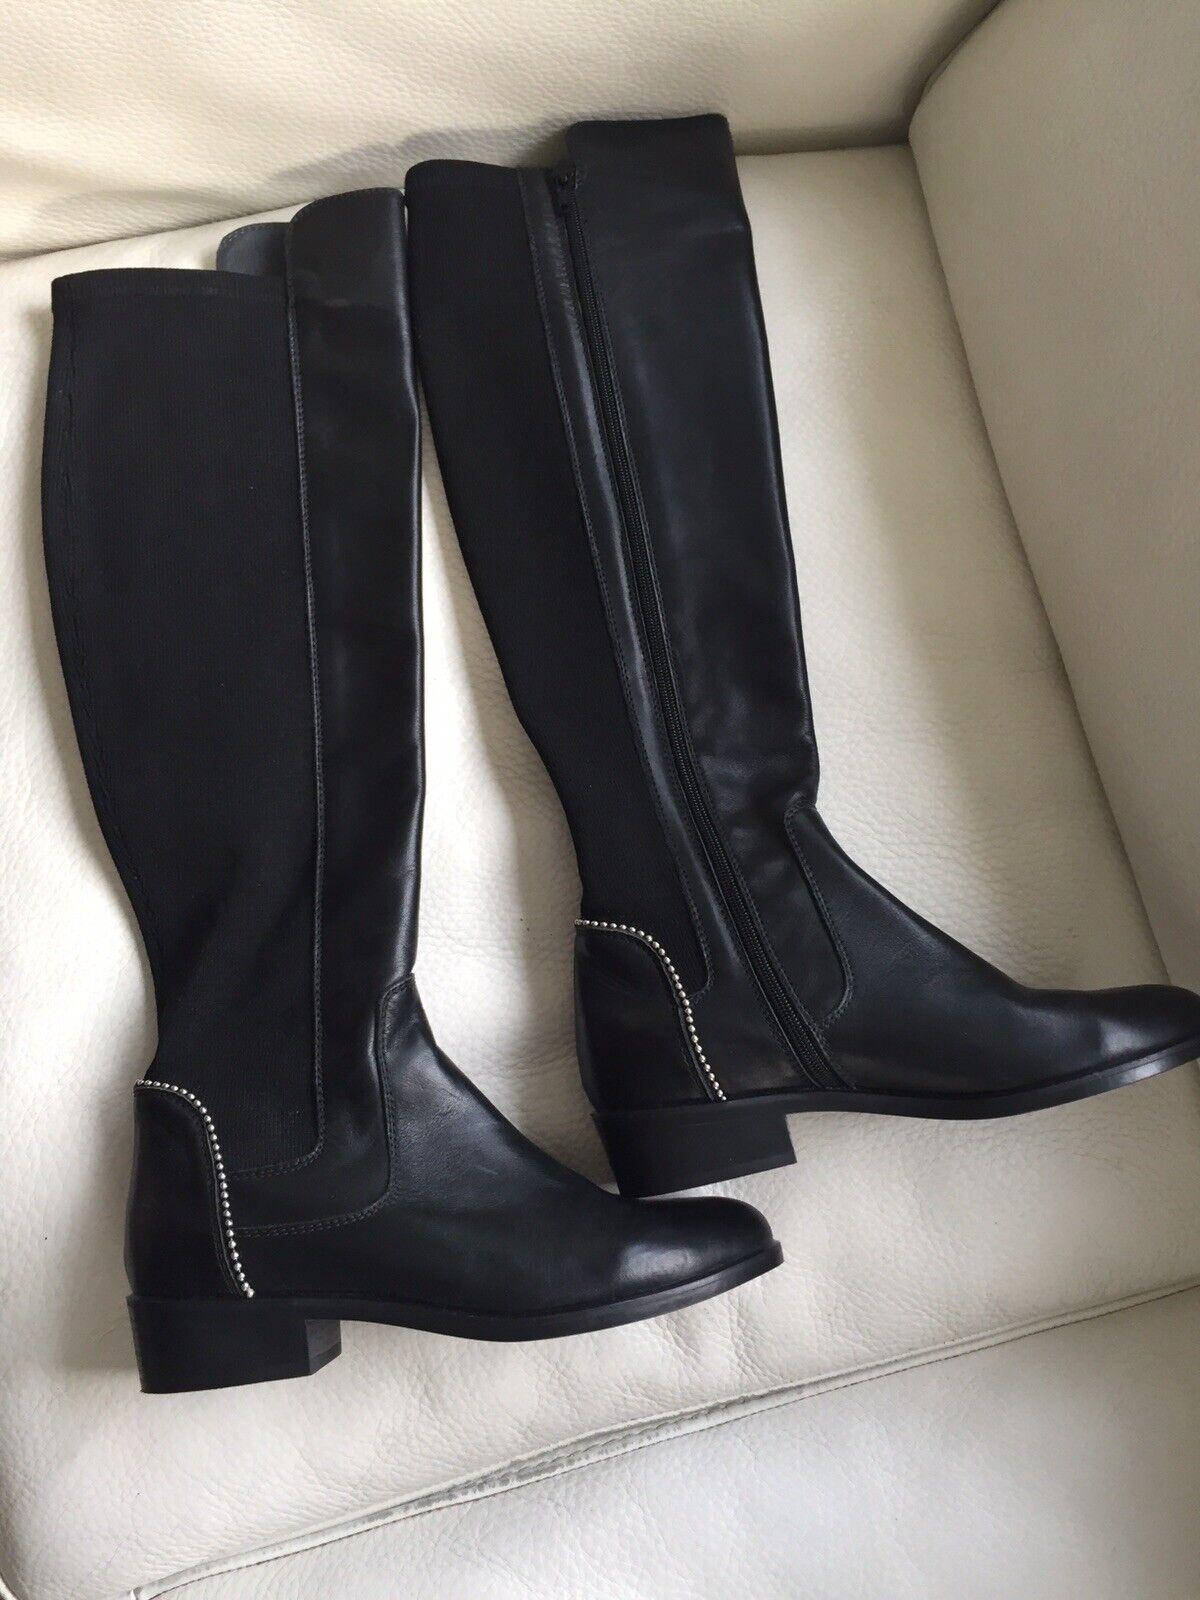 Kanna tolle Damen Stiefel (Overknee) , Gr 37 schwarz, Leder  Textil. Neu